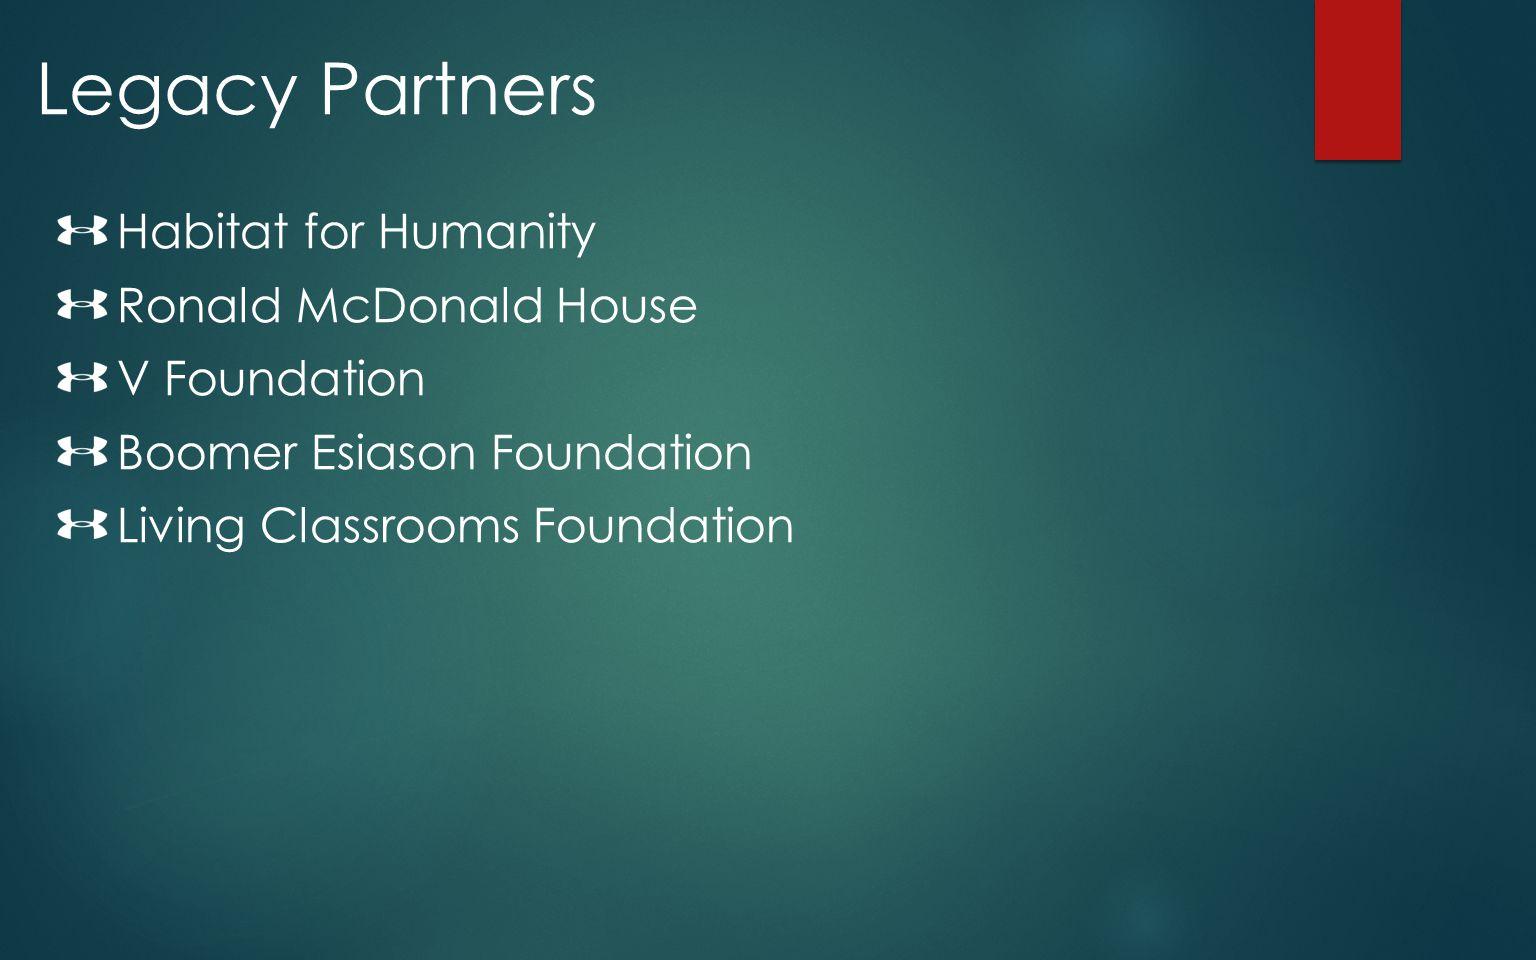 Habitat for Humanity Ronald McDonald House V Foundation Boomer Esiason Foundation Living Classrooms Foundation